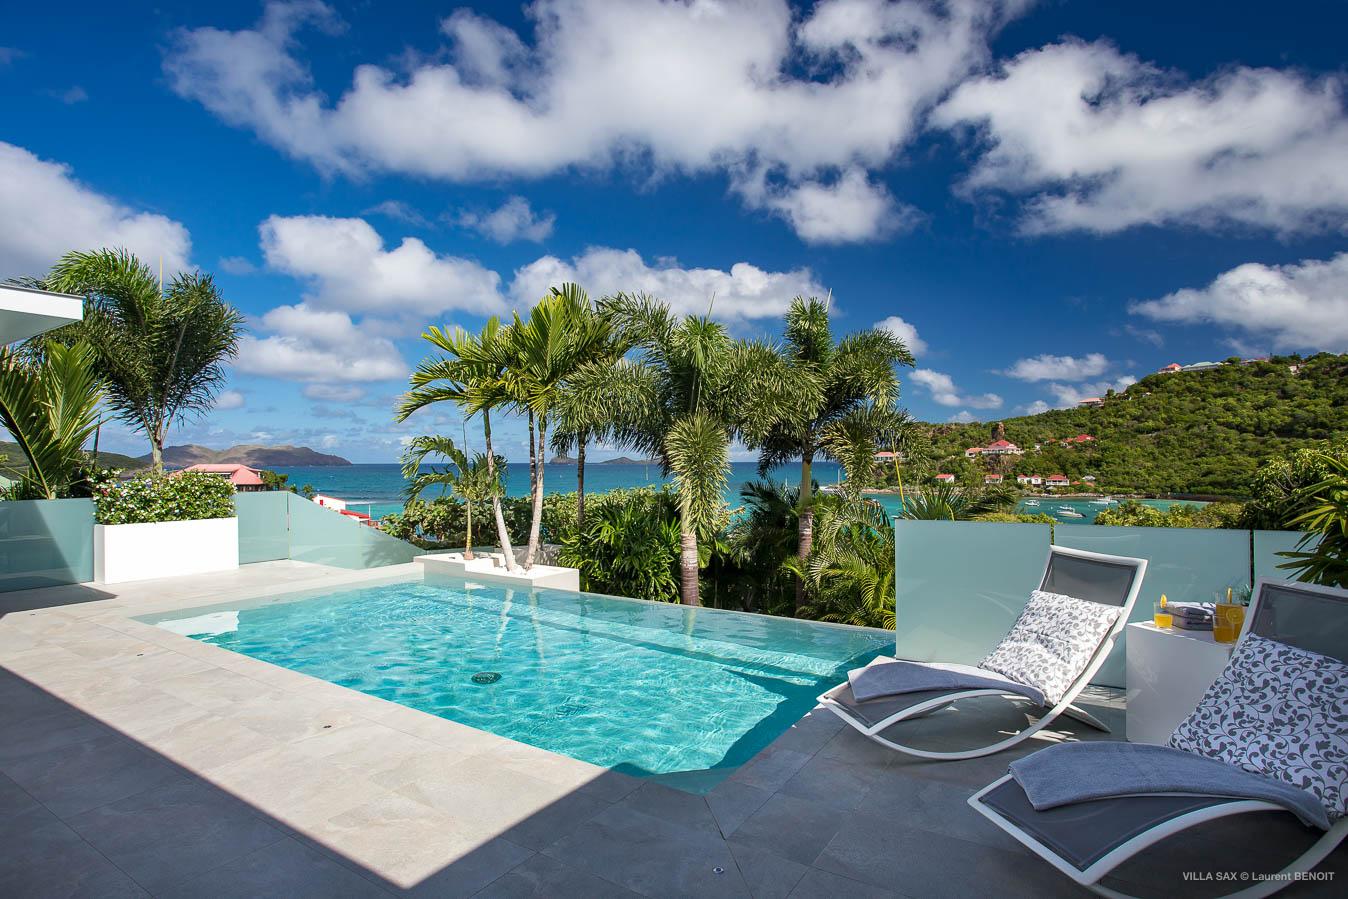 Villa Vacation Rental 4 Bedrooms St Barth Saint Jean St